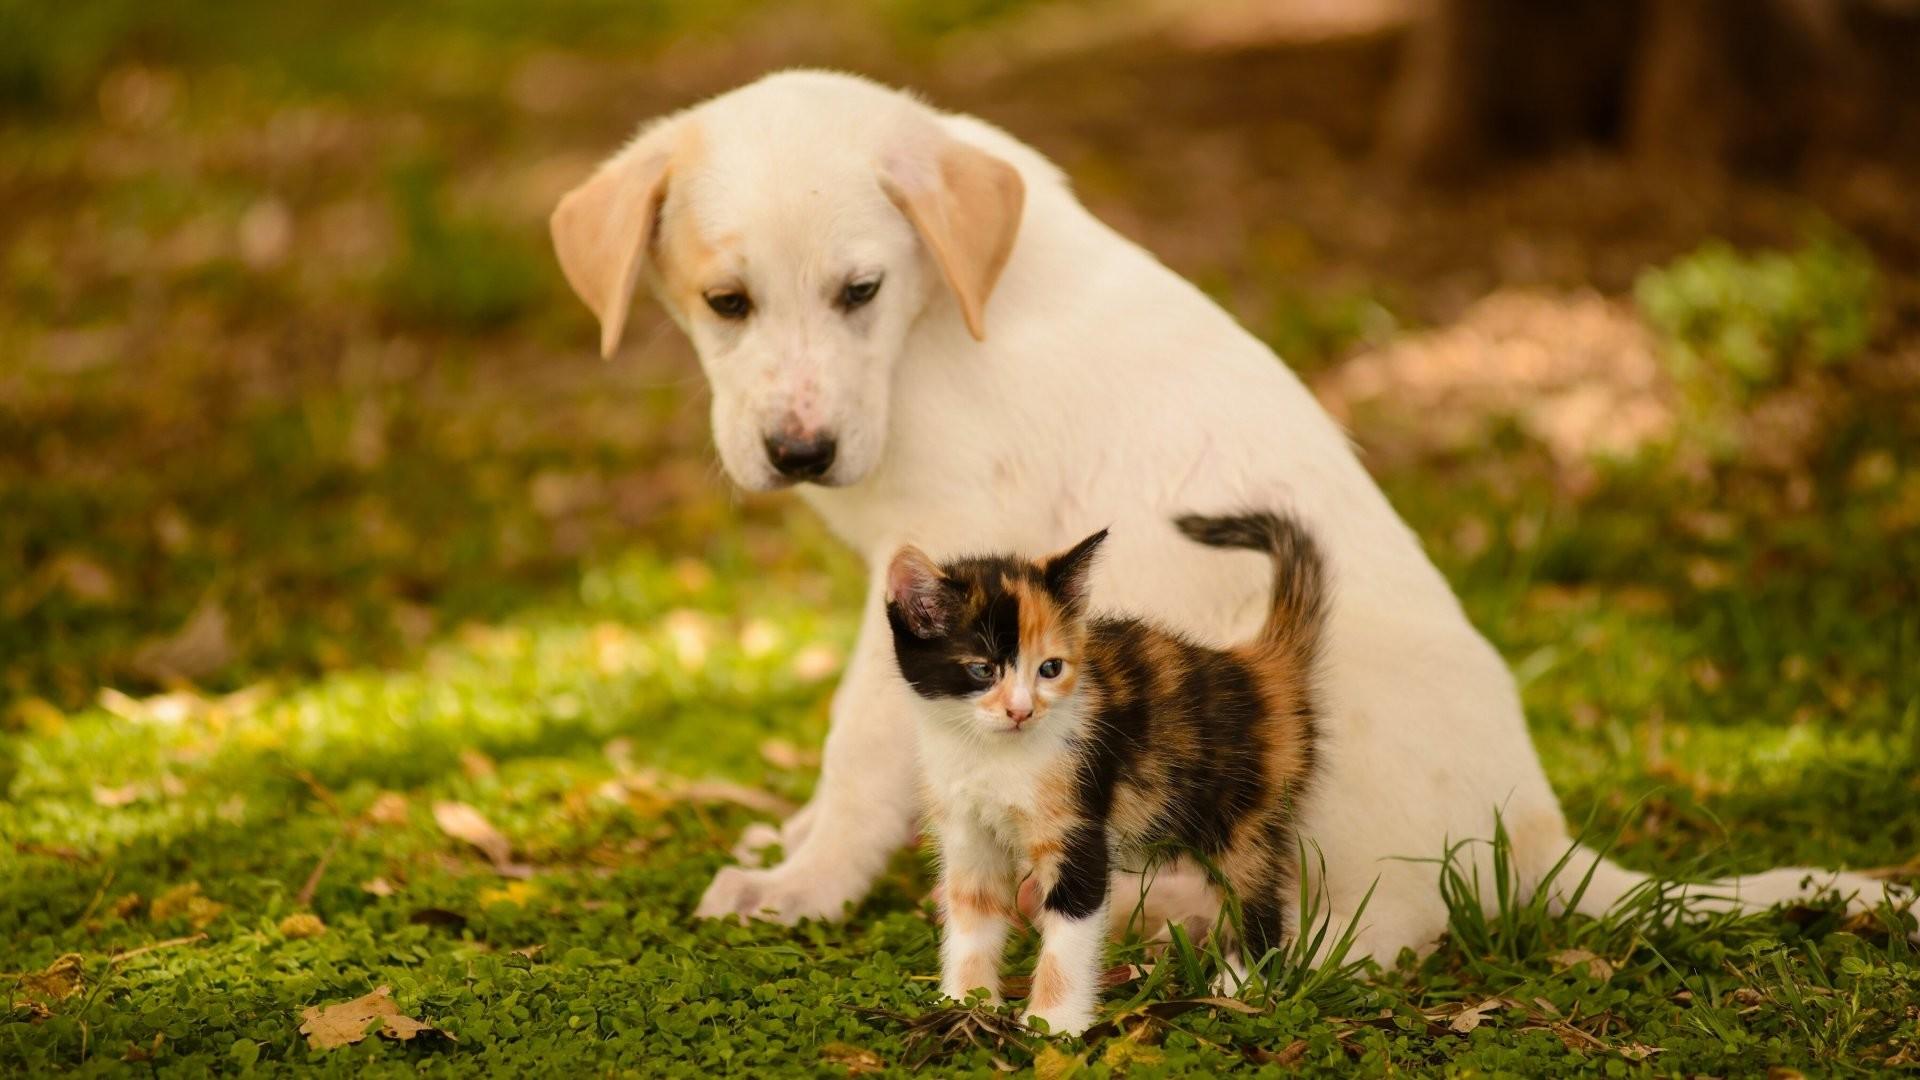 Dog Cat kitten friends baby wallpaper HD.